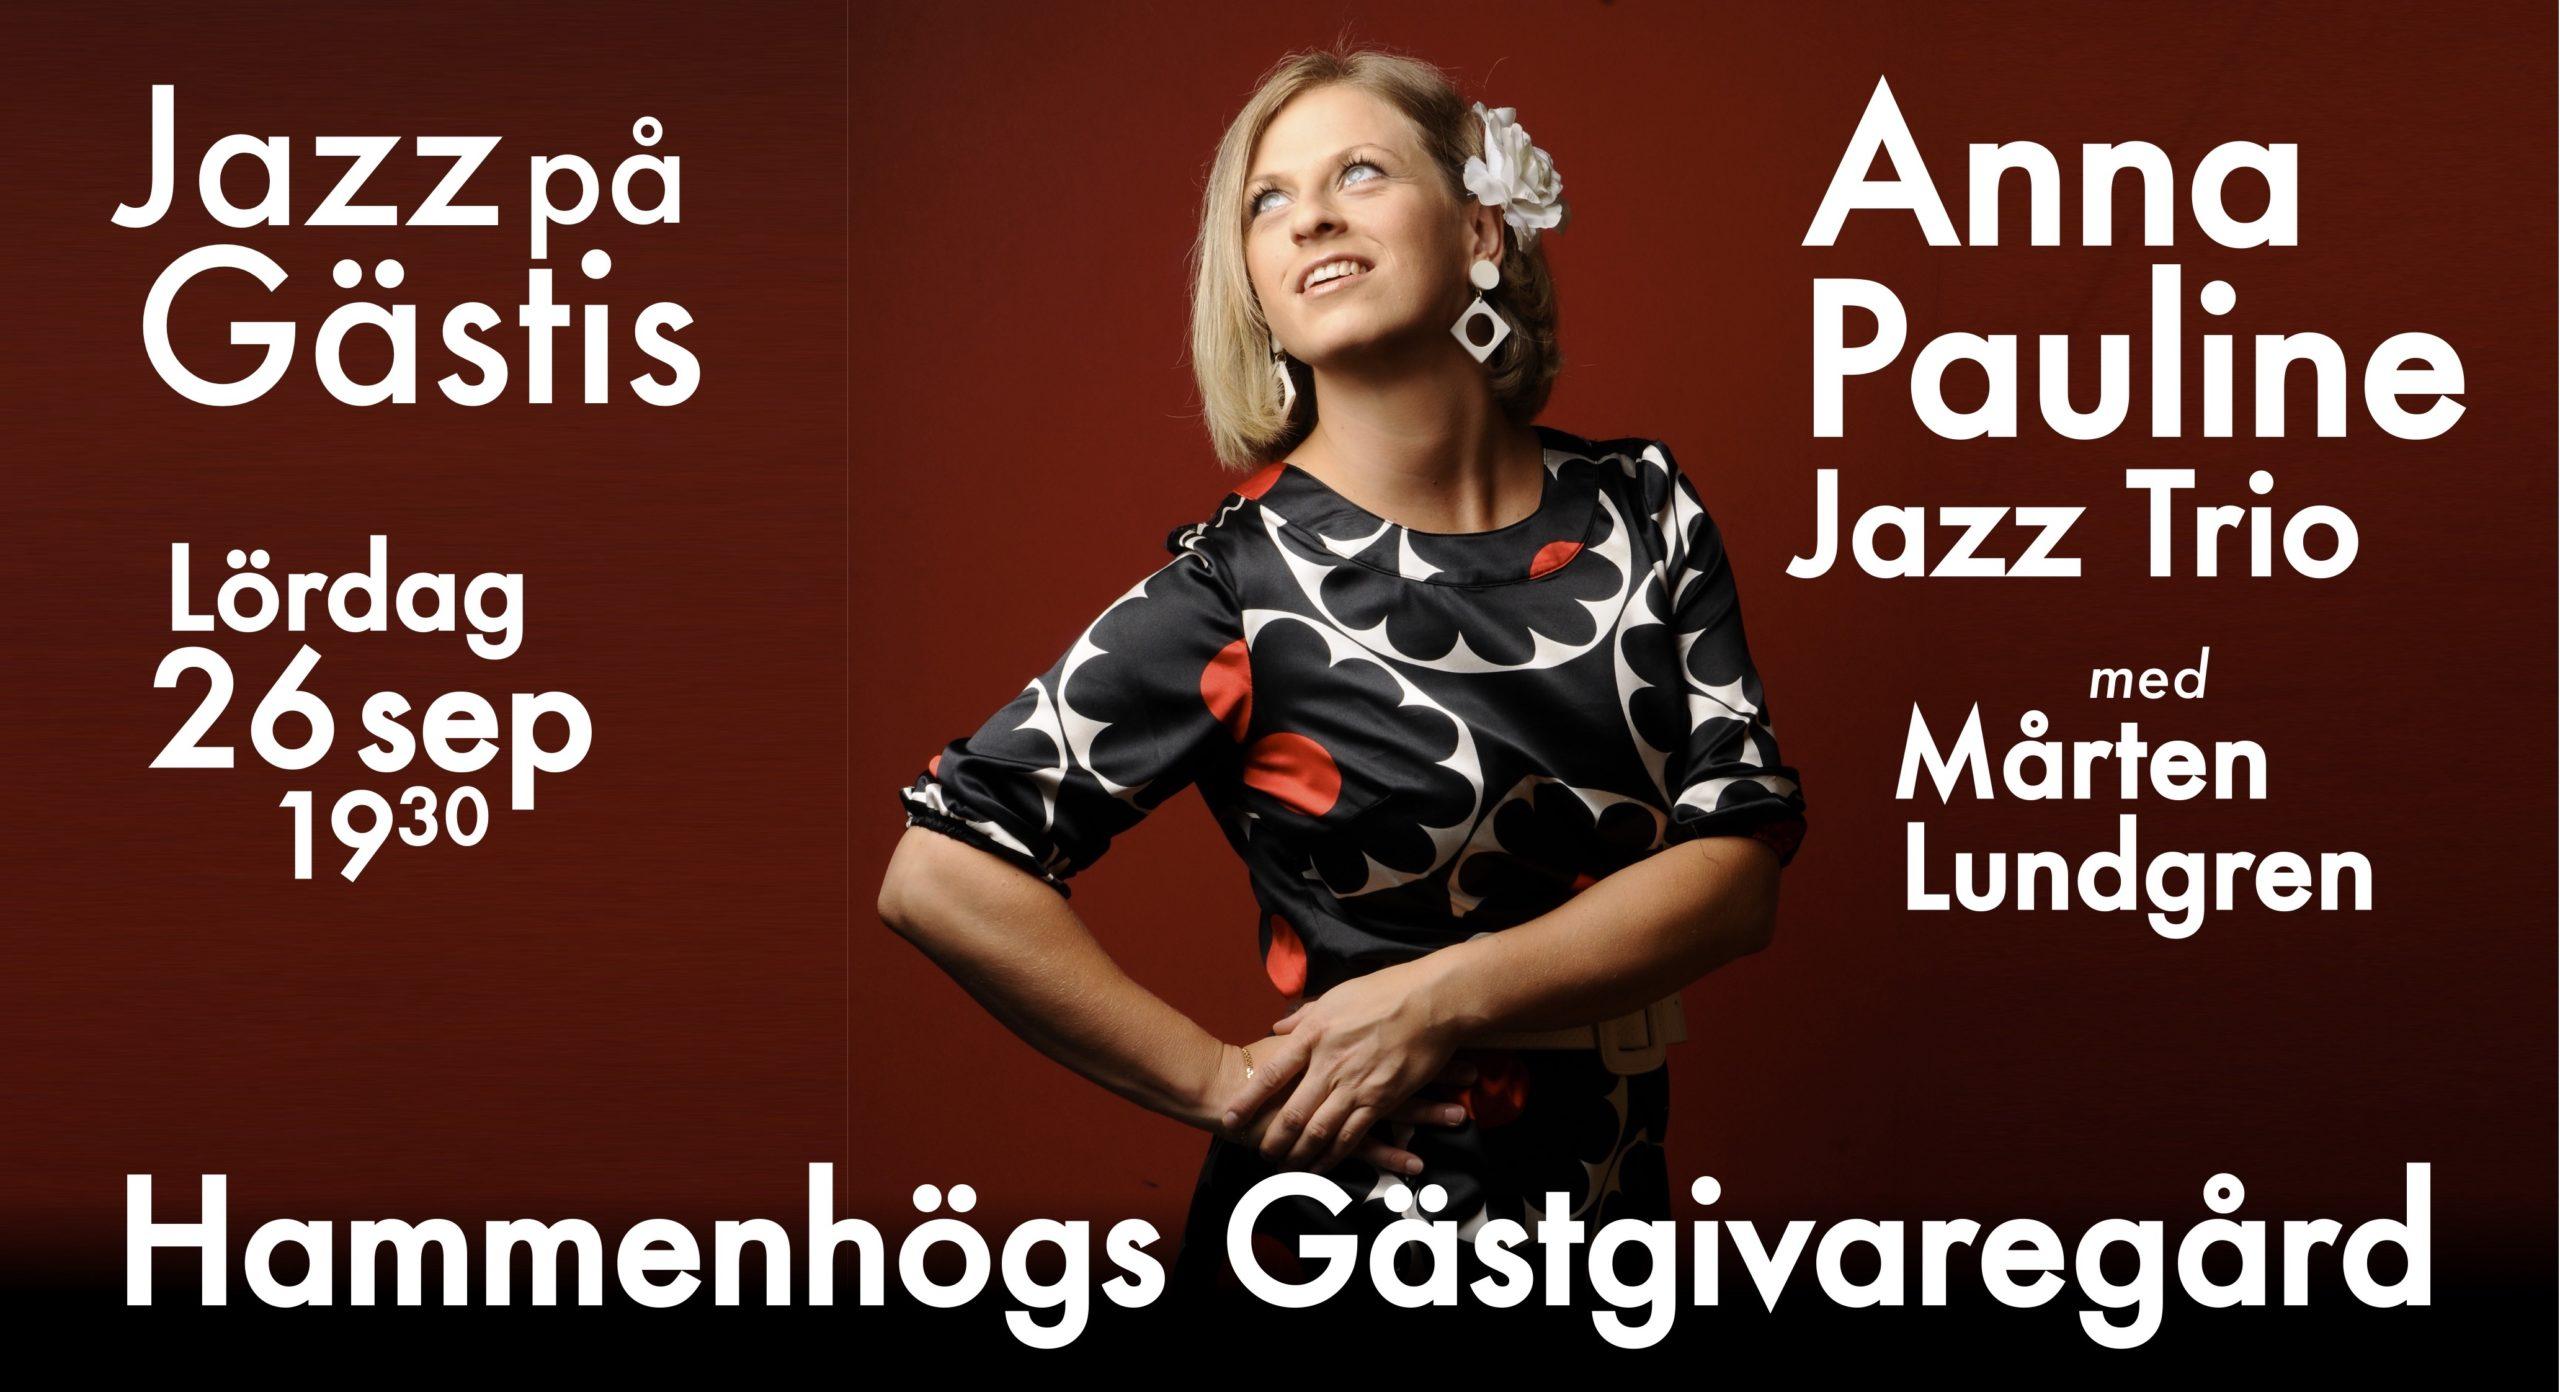 Anna Pauline FB 200926 scaled österlen.se